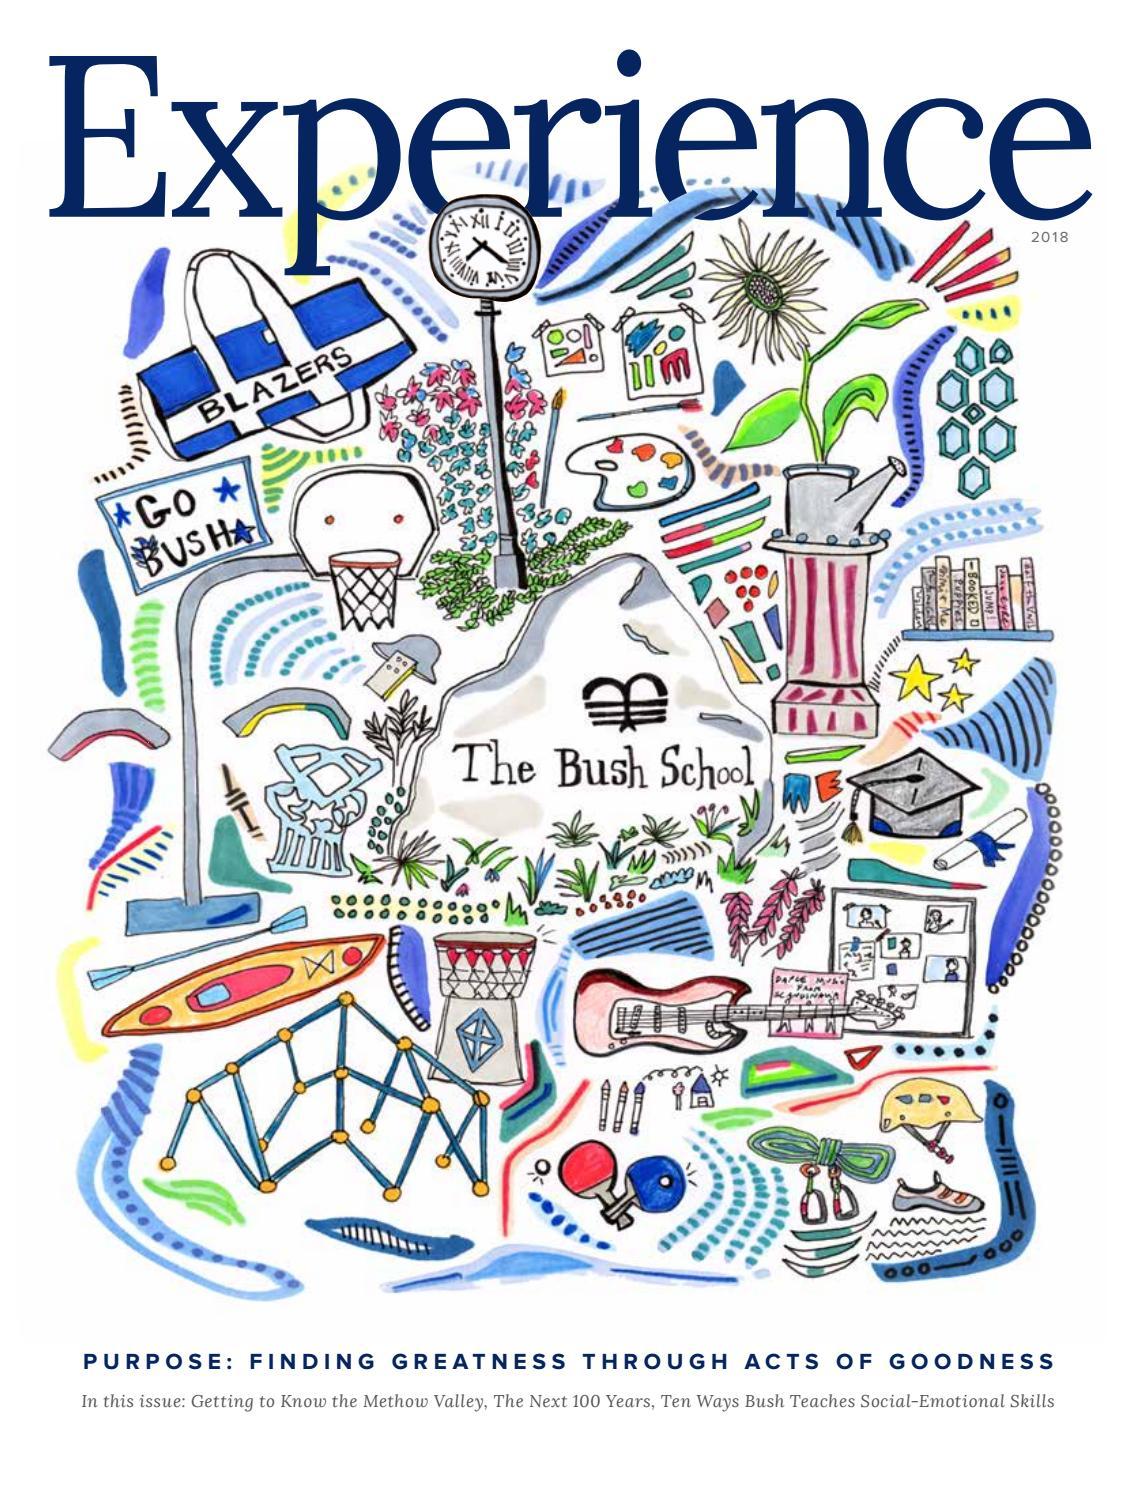 5e1f570e3b72e0 Experience Magazine 2018 by The Bush School - issuu